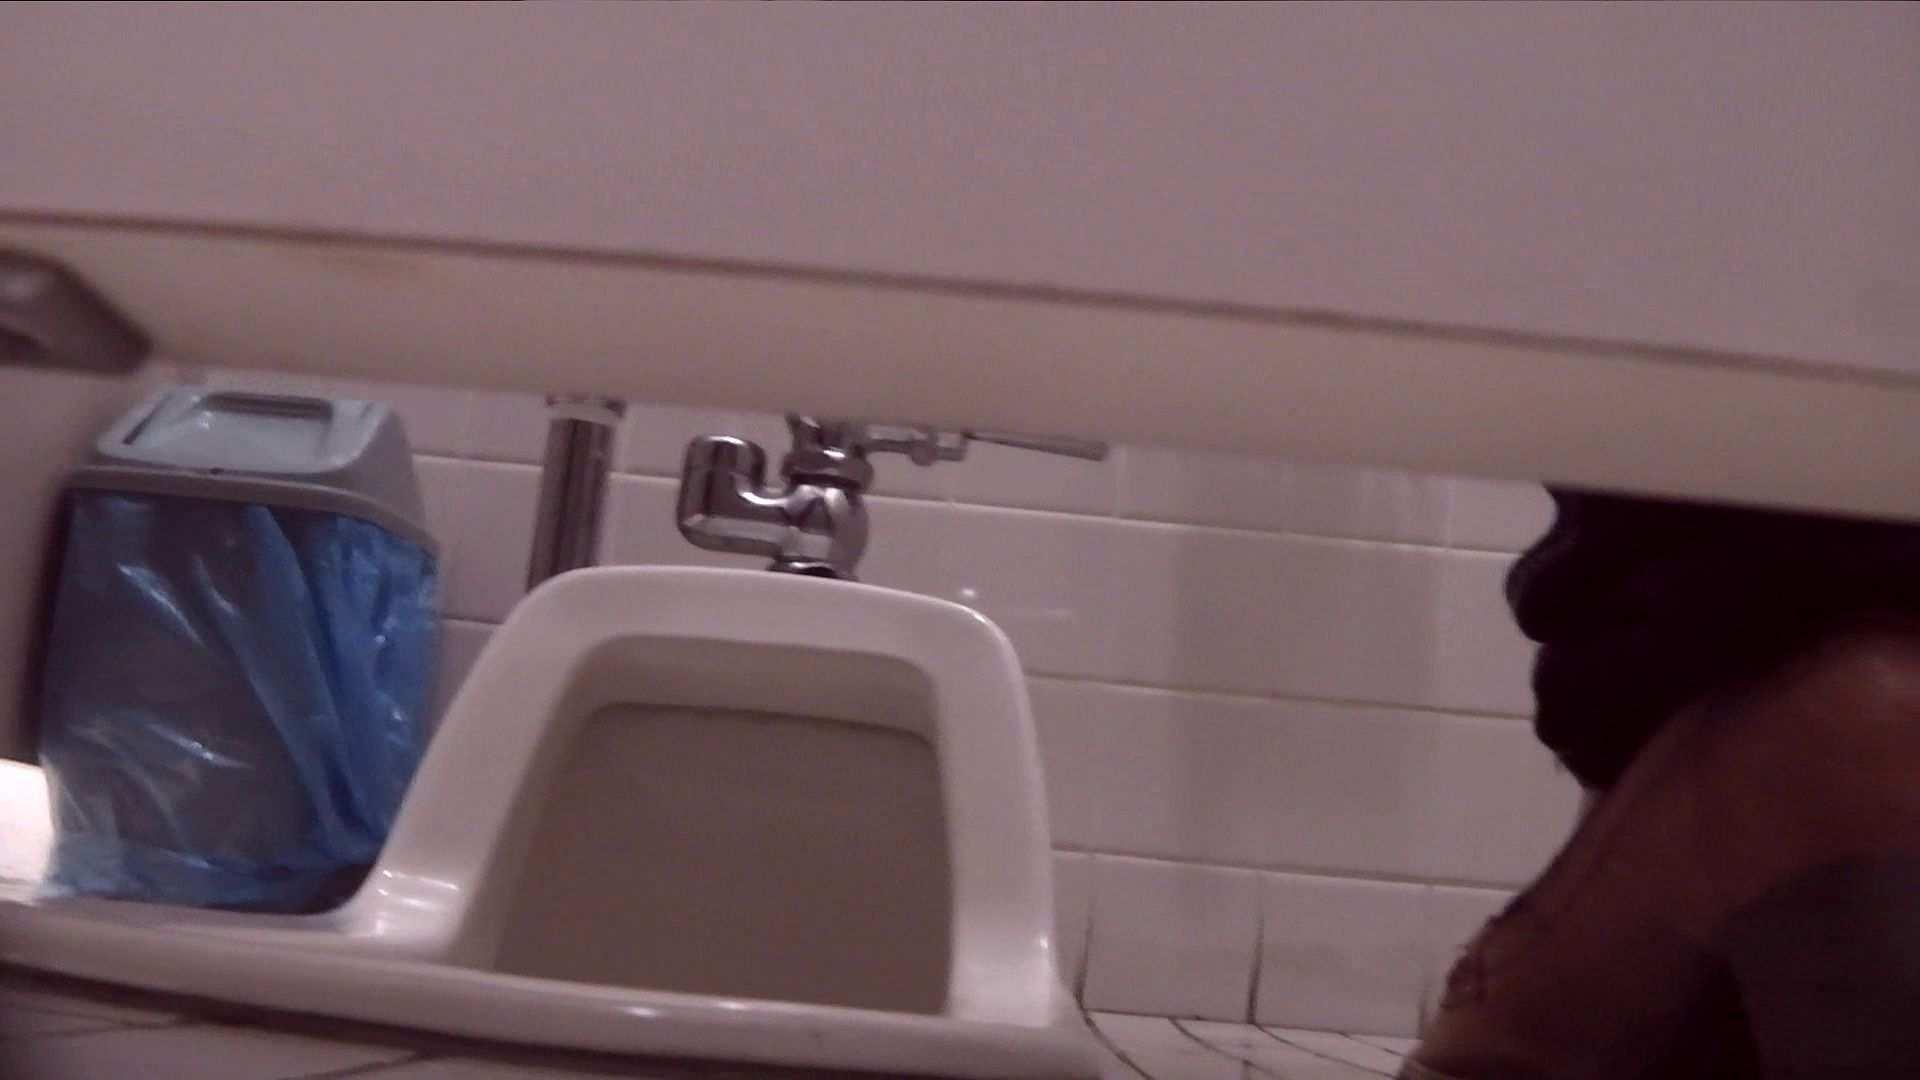 vol.17 命がけ潜伏洗面所! 張り裂けんばかりの大物 潜入 盗み撮り動画 69連発 28